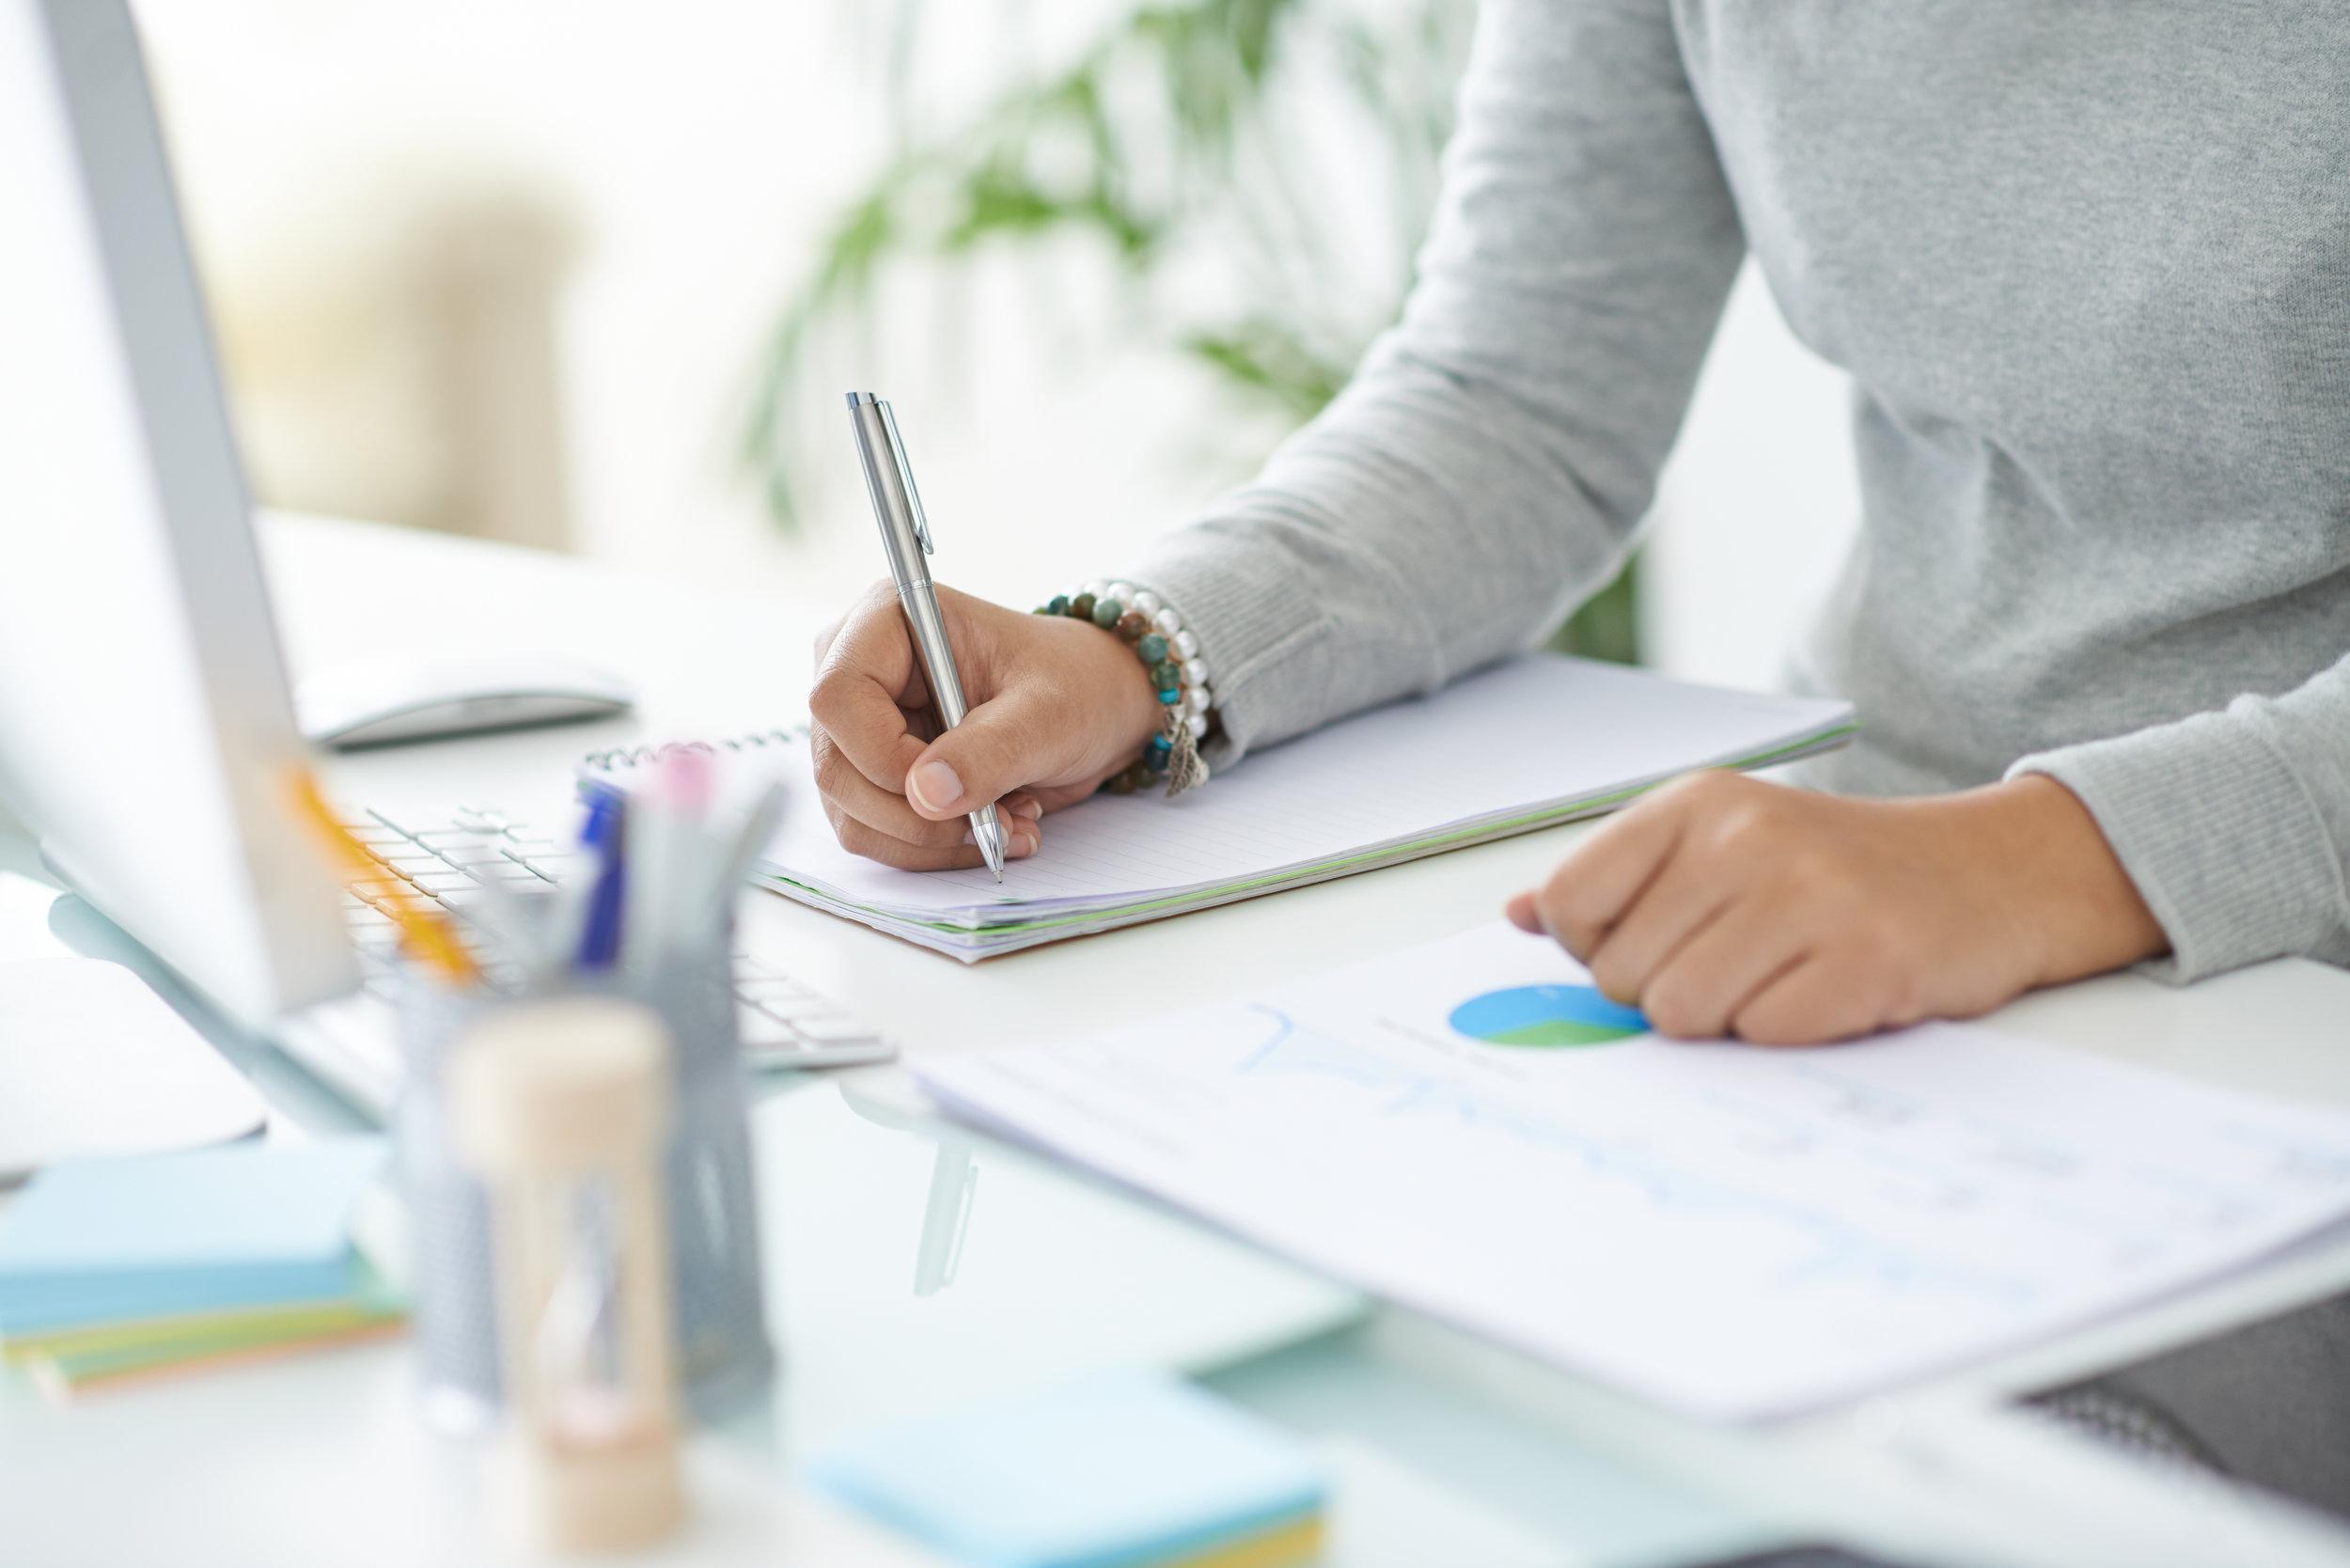 Organization and Focus